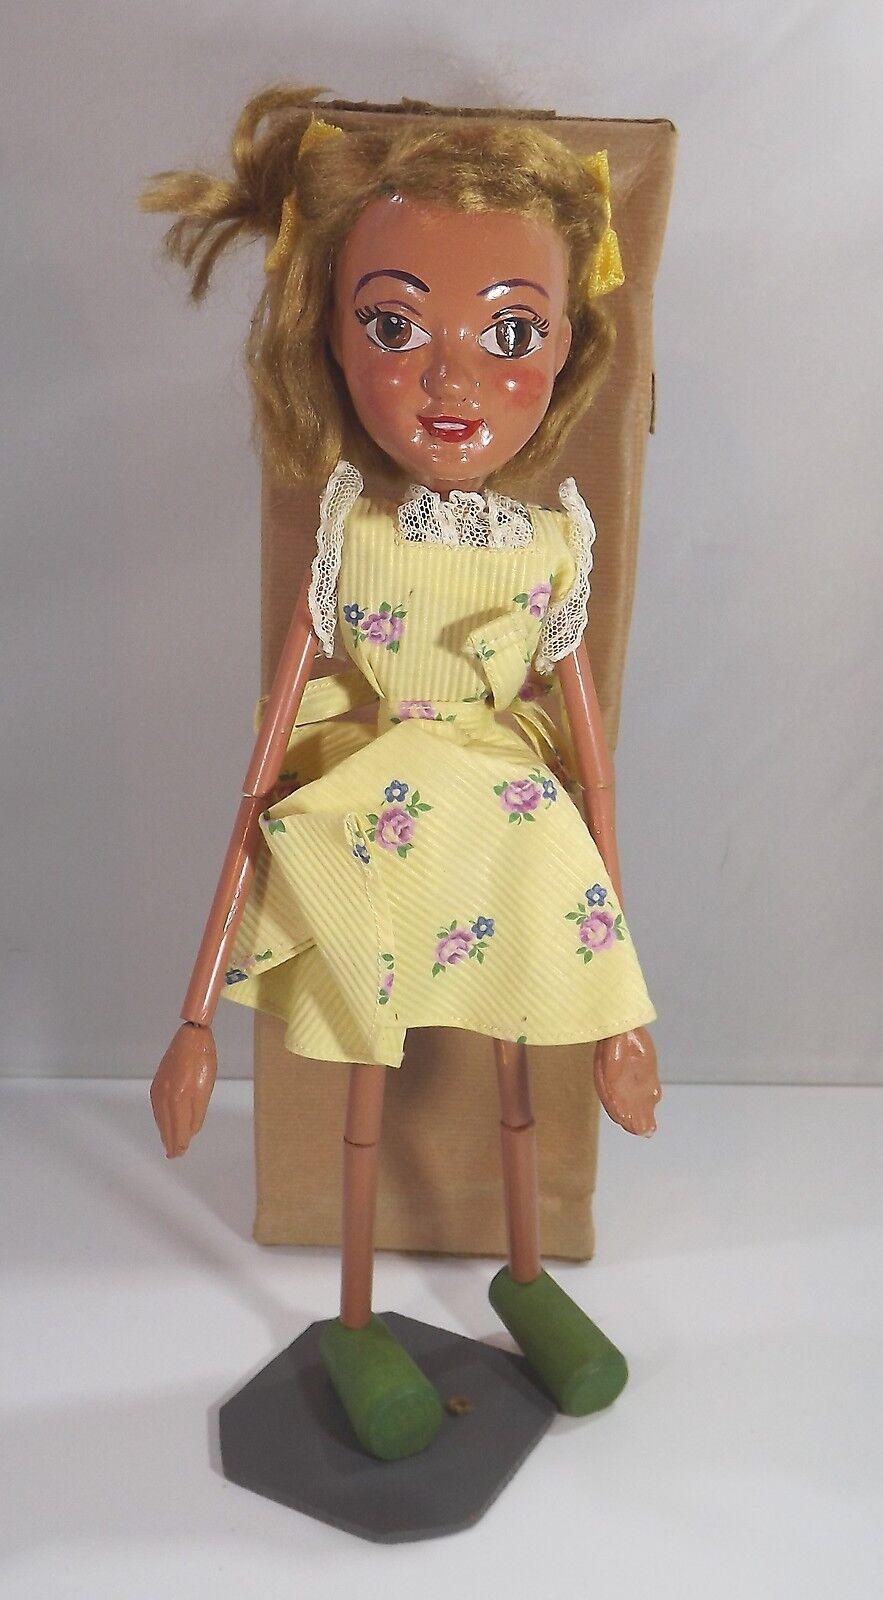 Boxed Vintage 1940s 50s Pelham Puppets Bendy Bendipup Girl Type SL Display Piece